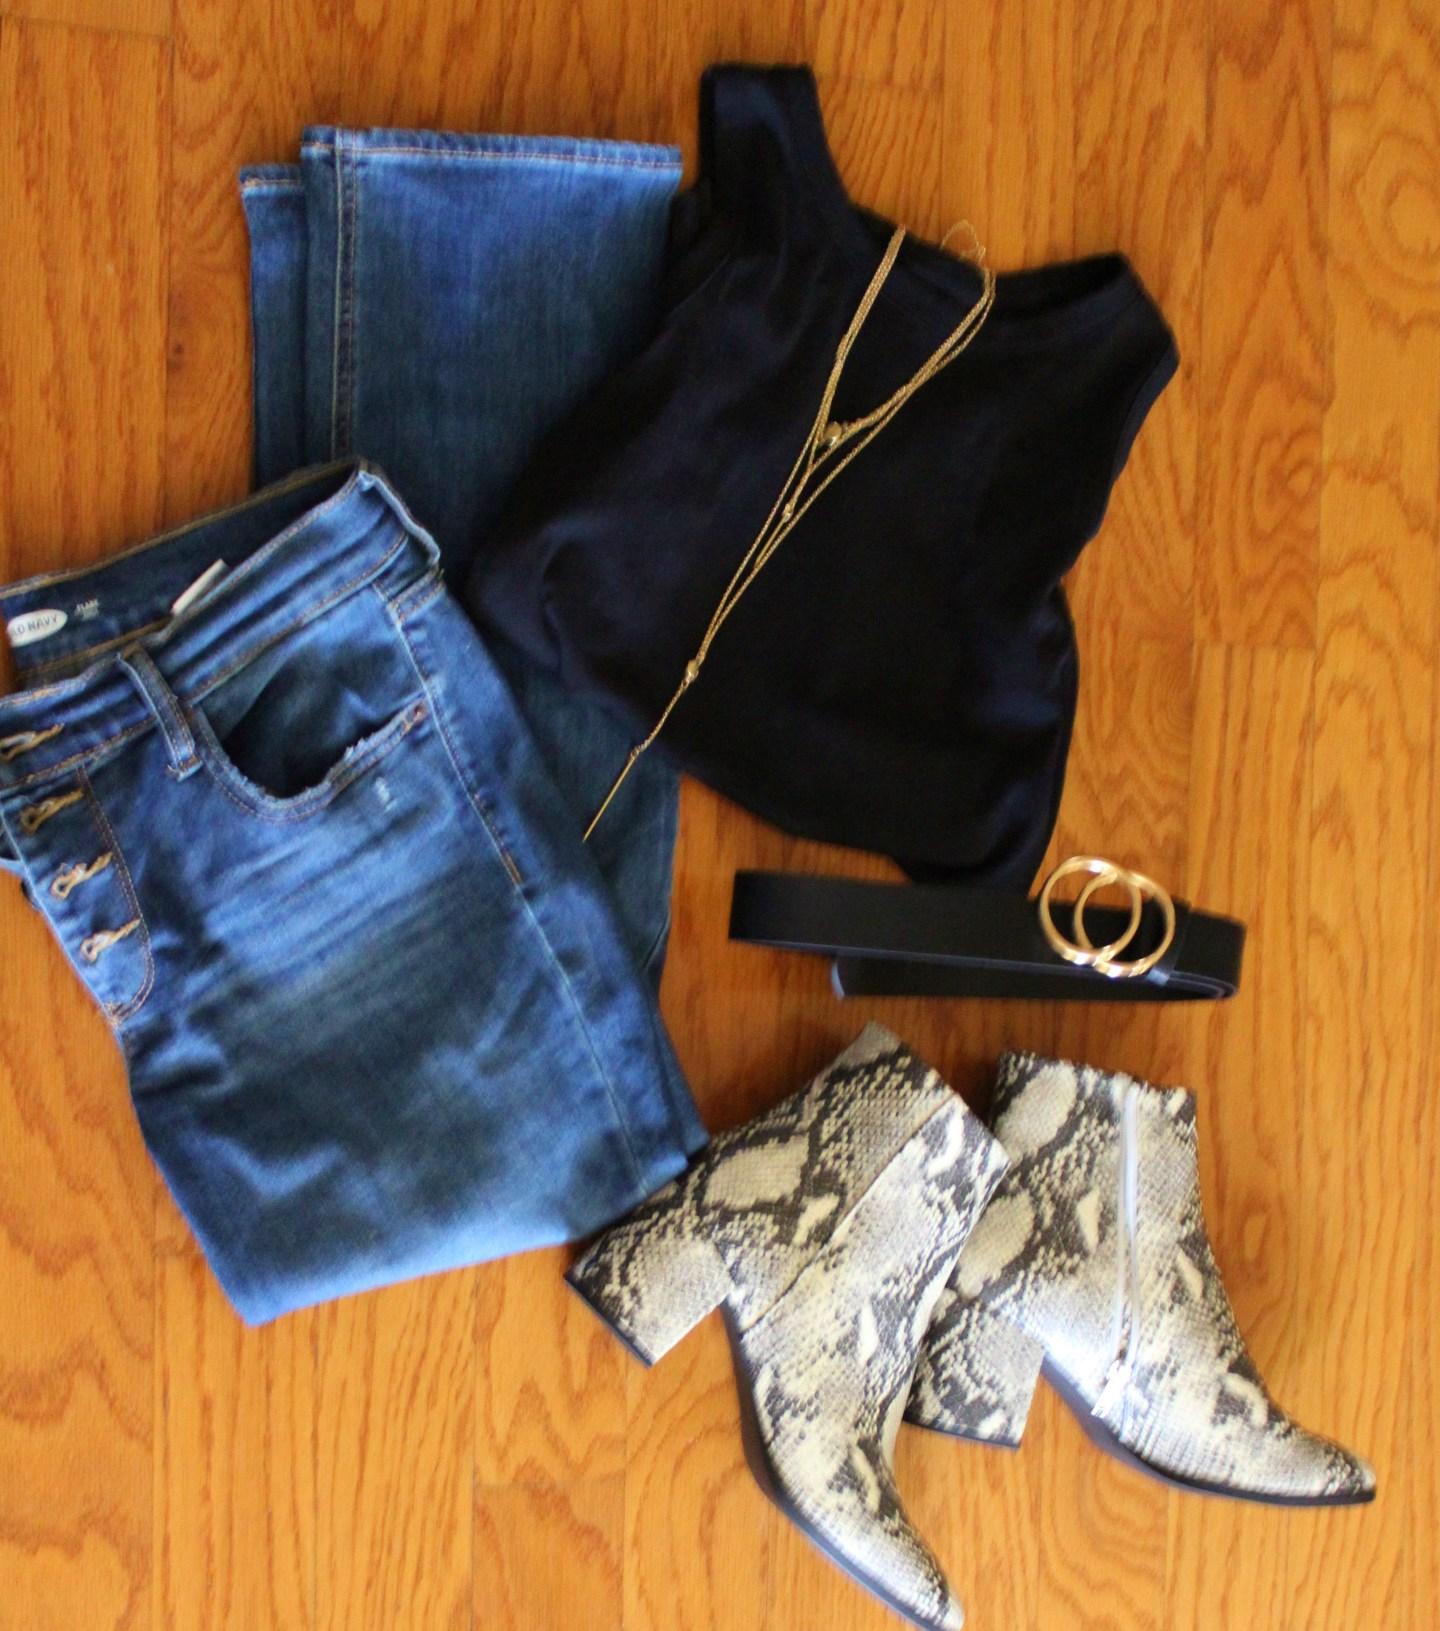 snakeskin booties + jeans